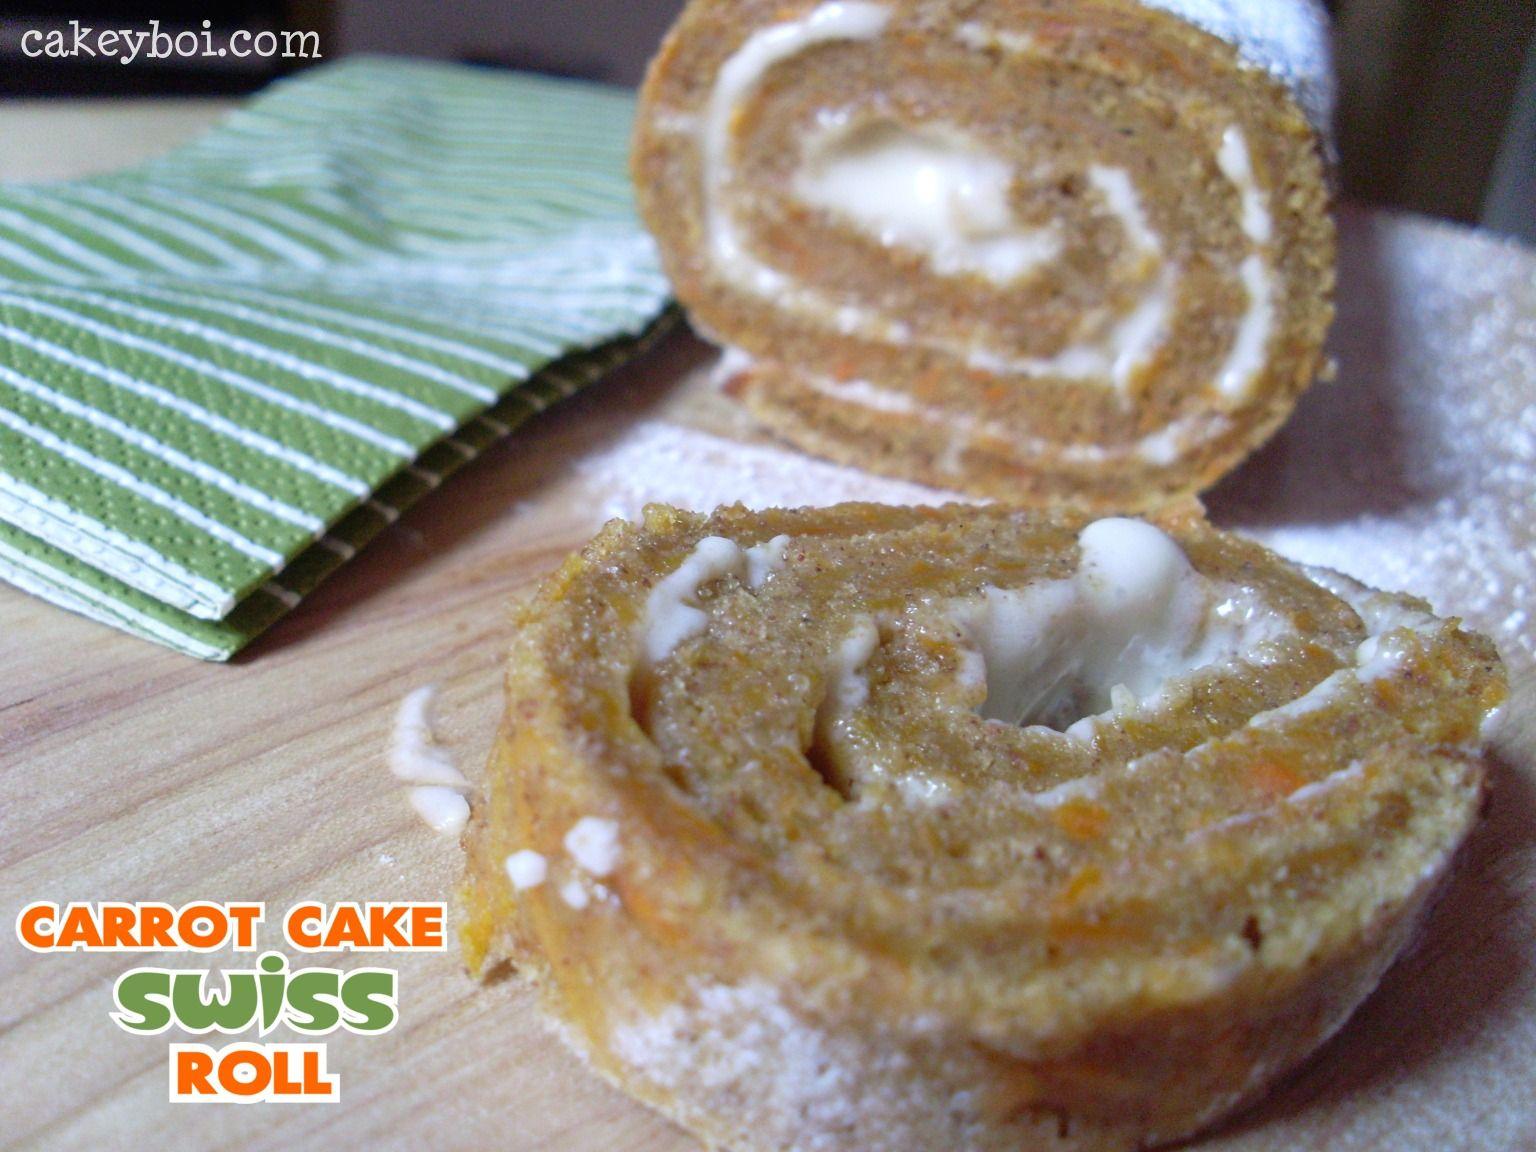 Carrot Cake Swiss Roll